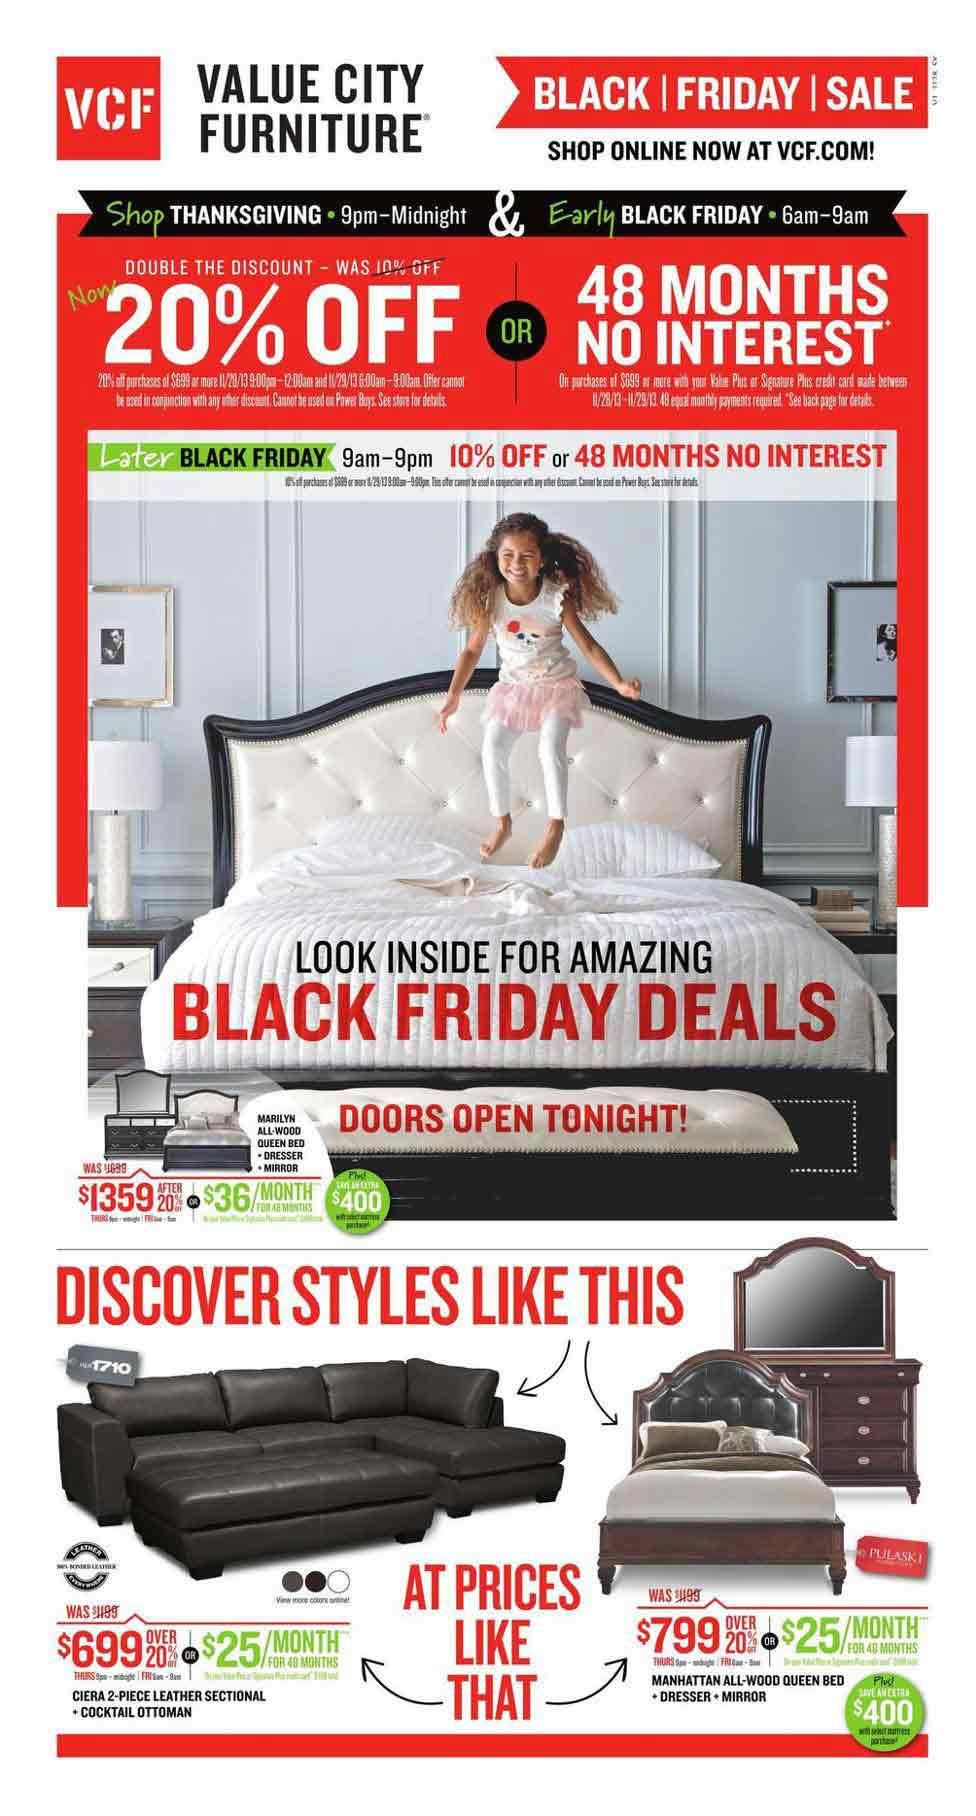 Value-City-Furniture-Black-Friday-01